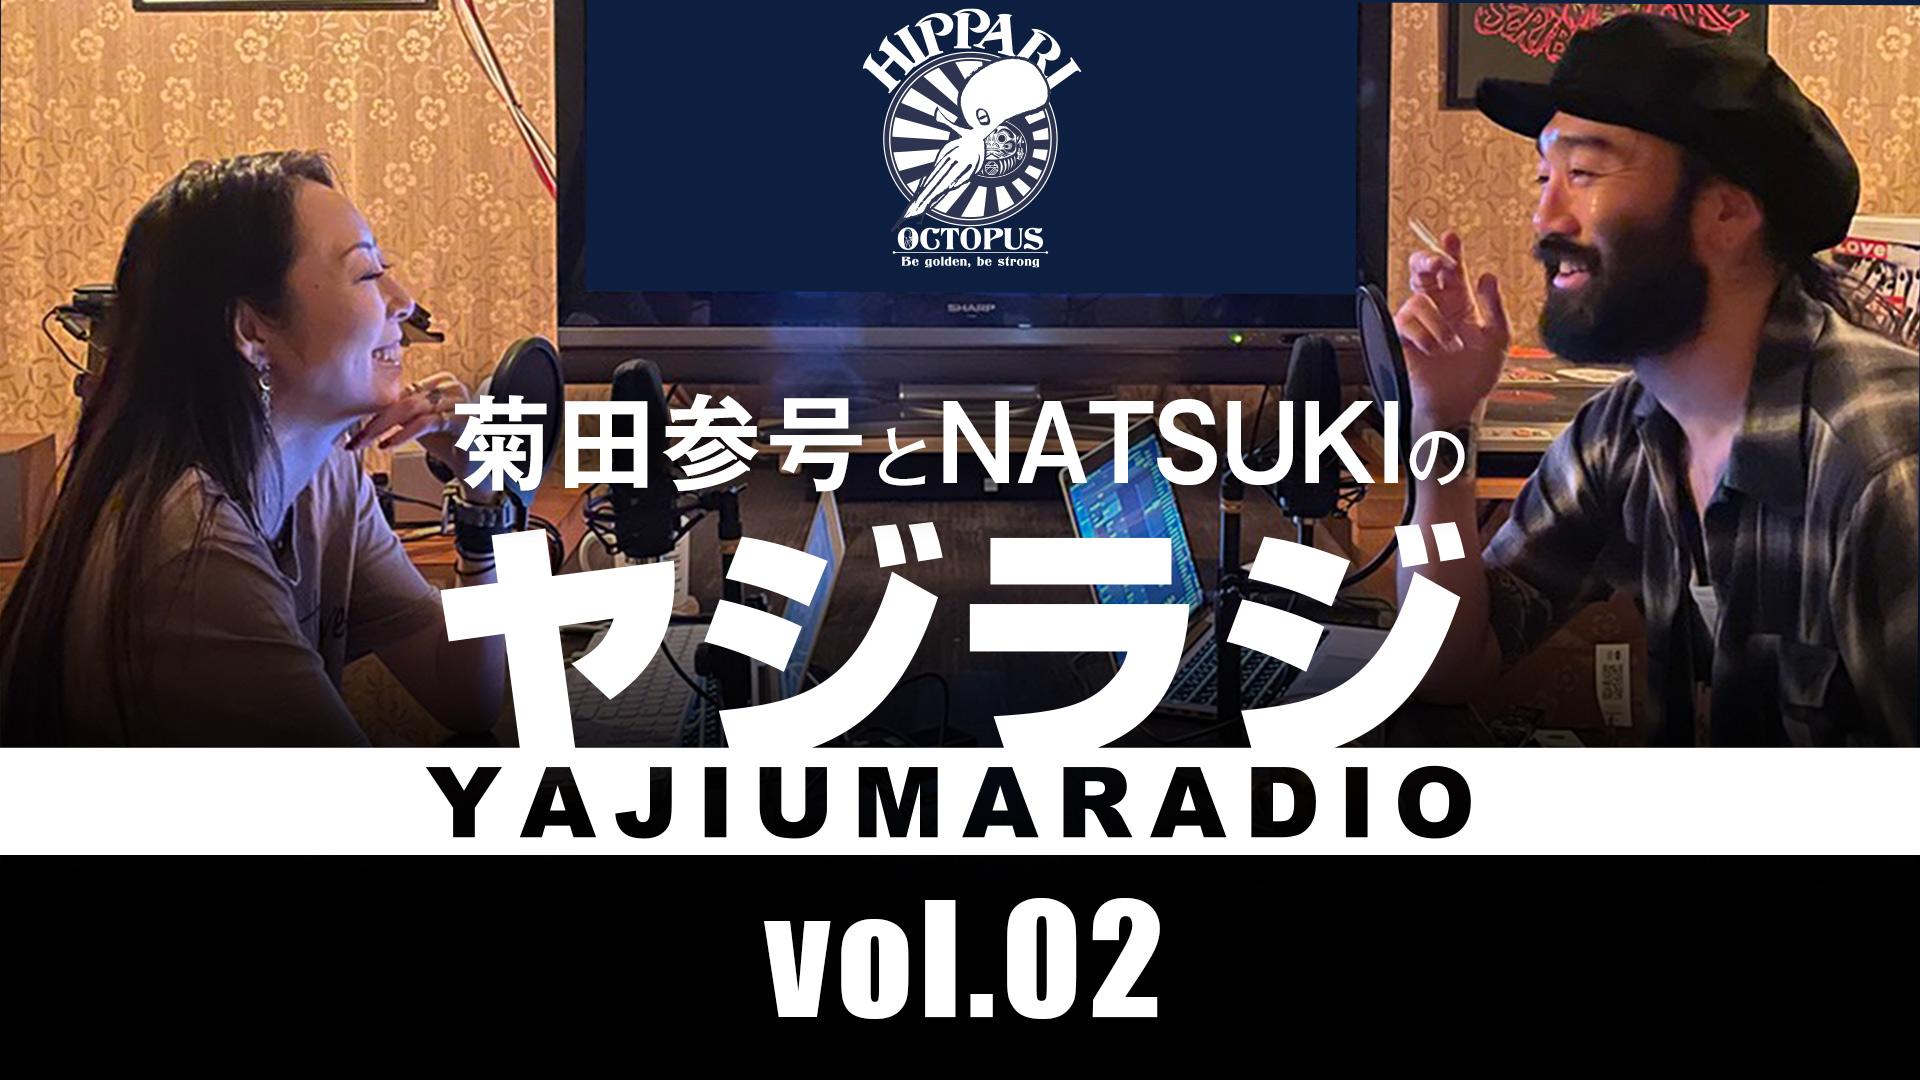 【vol.02】金縛りで免許取り消し!? / 菊田参号とNATSUKIの「ヤジウマラジオ」